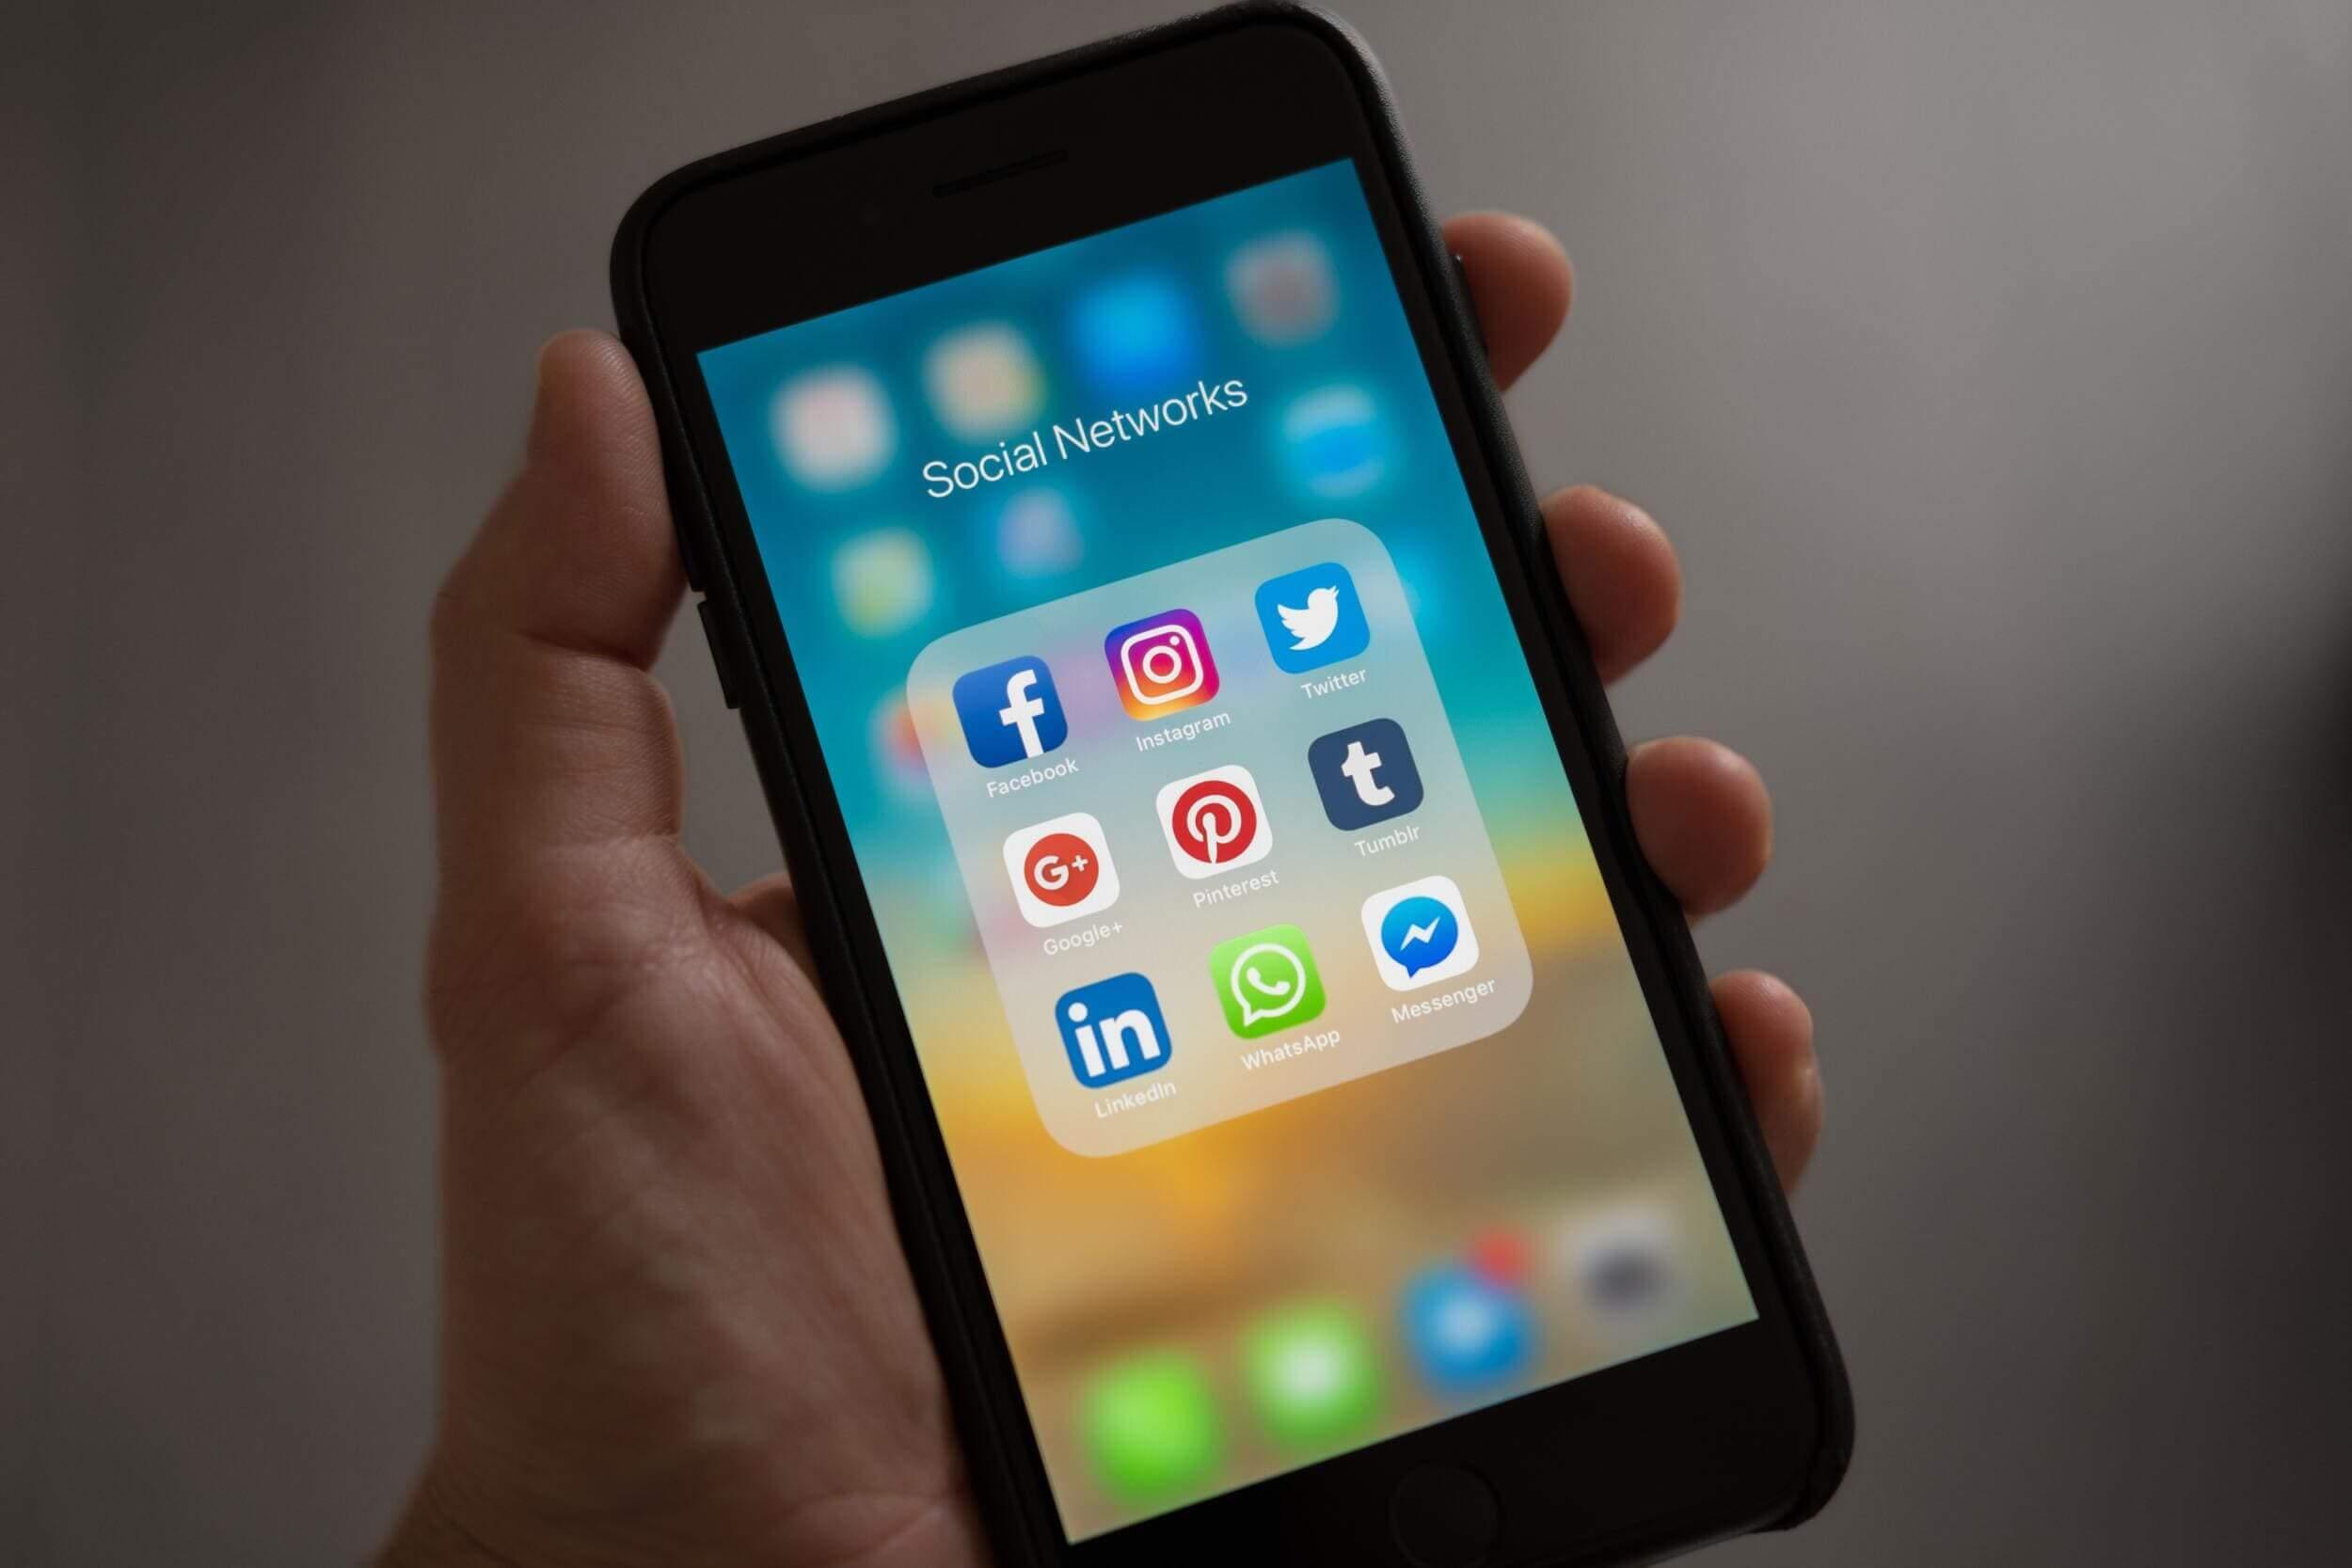 Social Media abgeben oder selbst machen